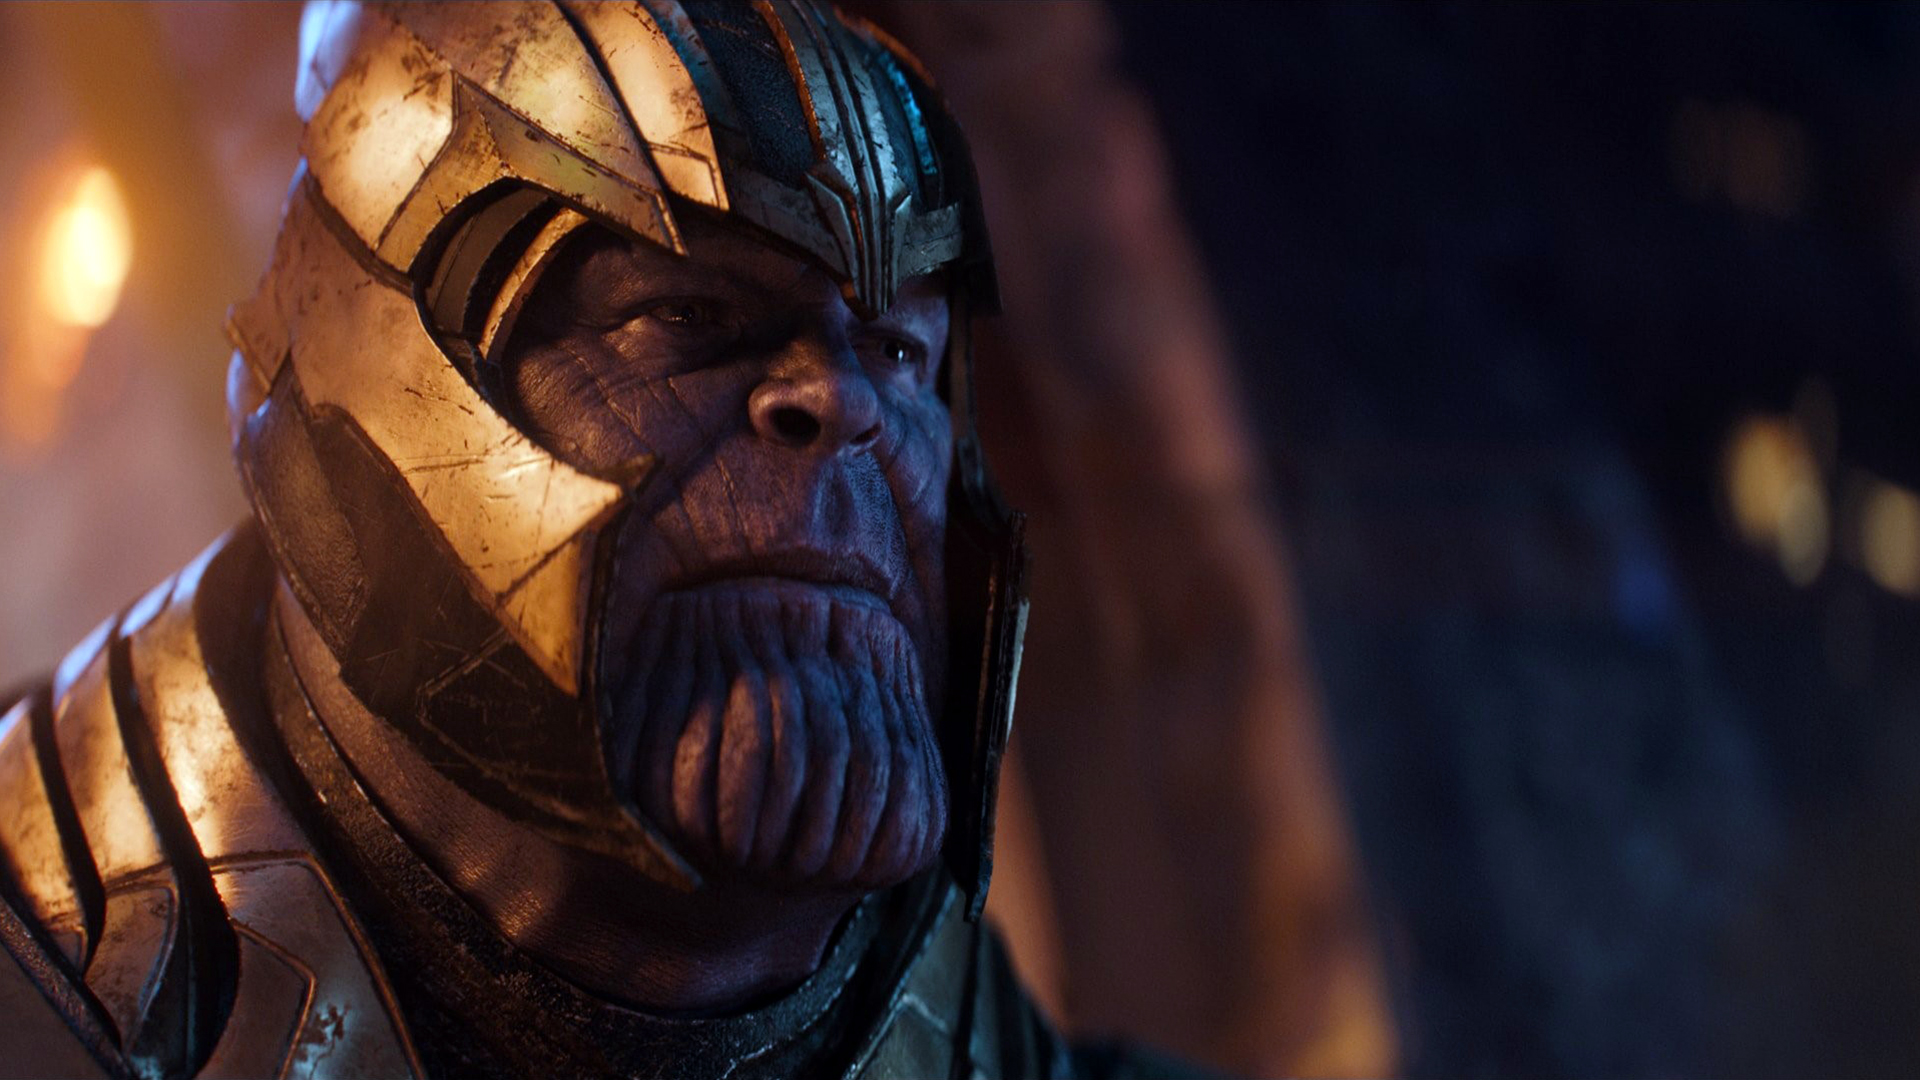 Wallpaper Thanos Avengers Infinity War Artwork Hd: Thanos In Avengers Infinity War Movie, HD Movies, 4k